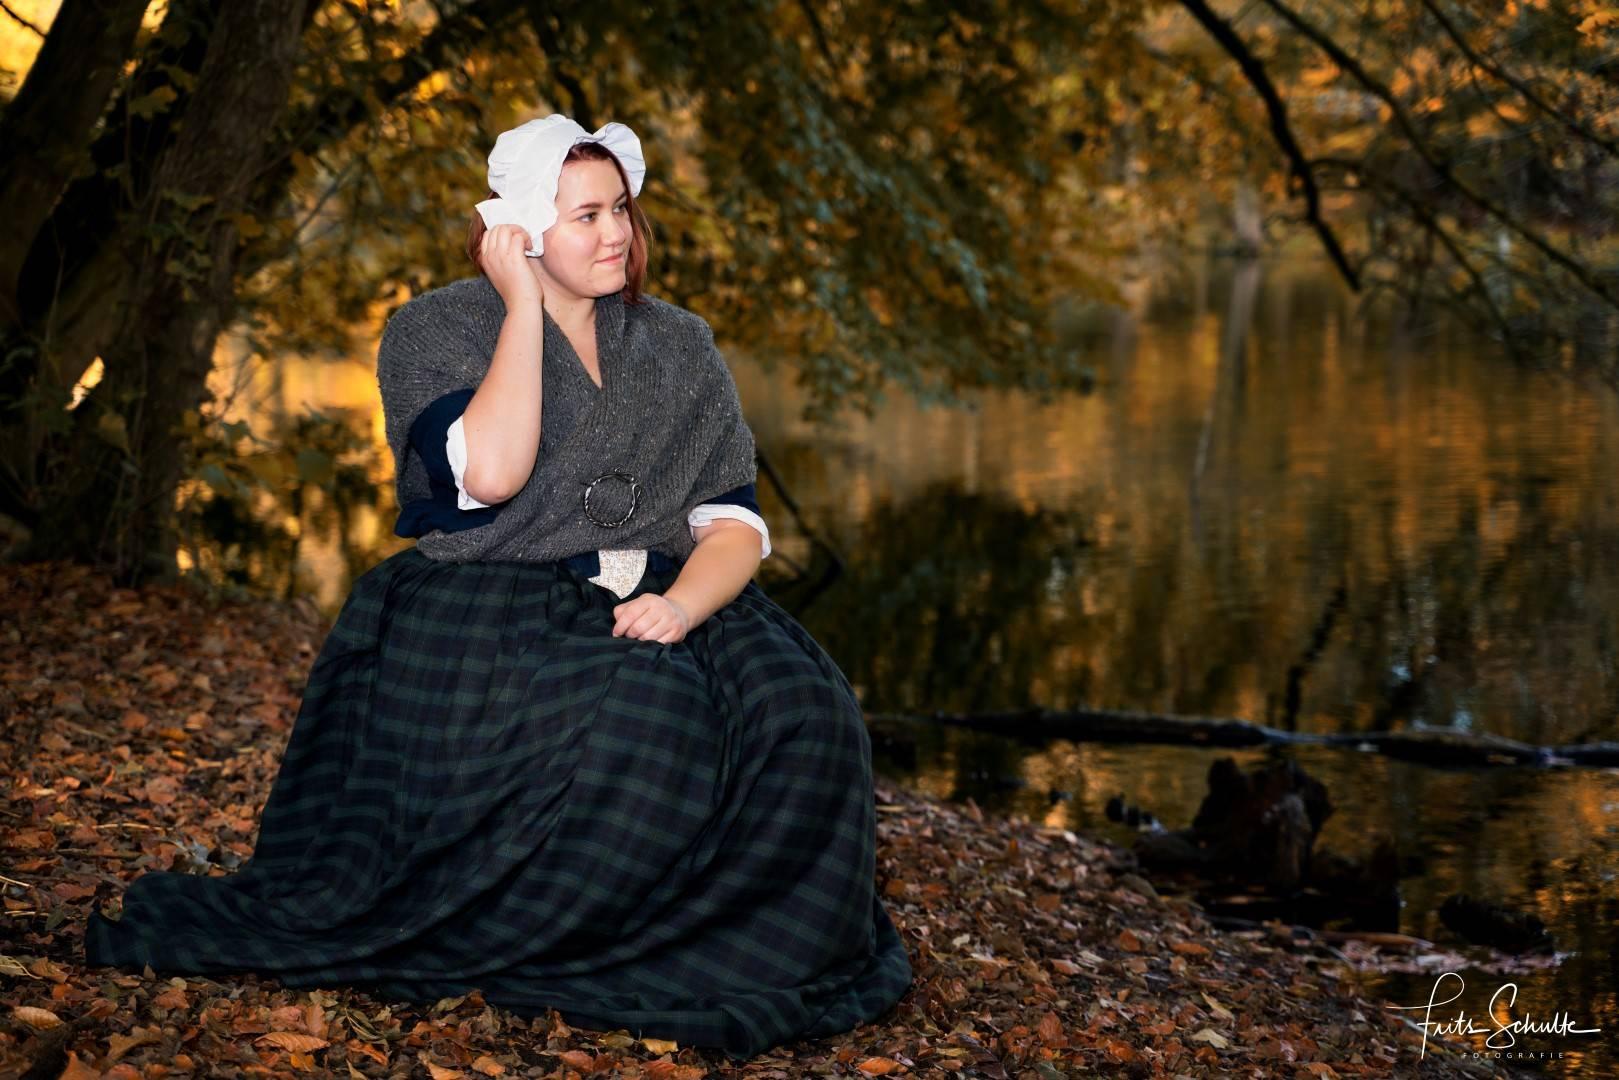 Model: Inge Ovinge